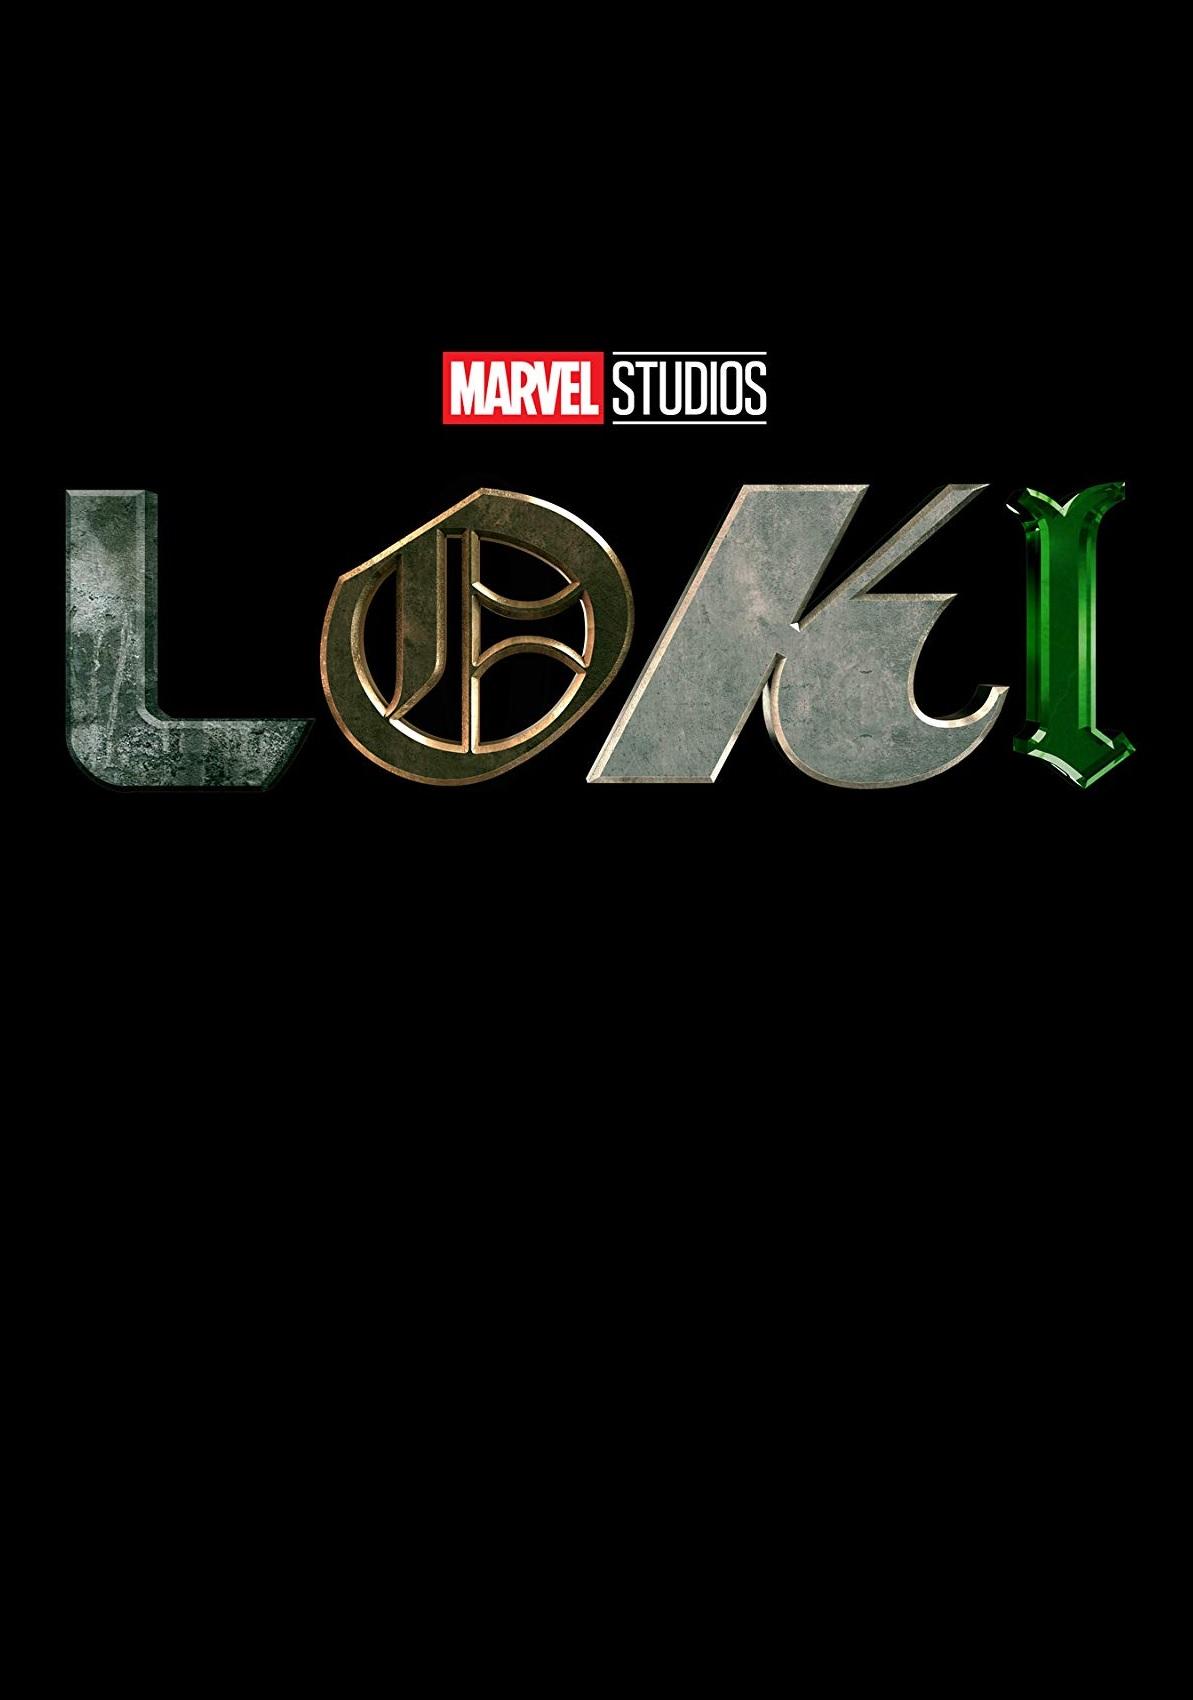 Loki series starring Tom Hiddleston